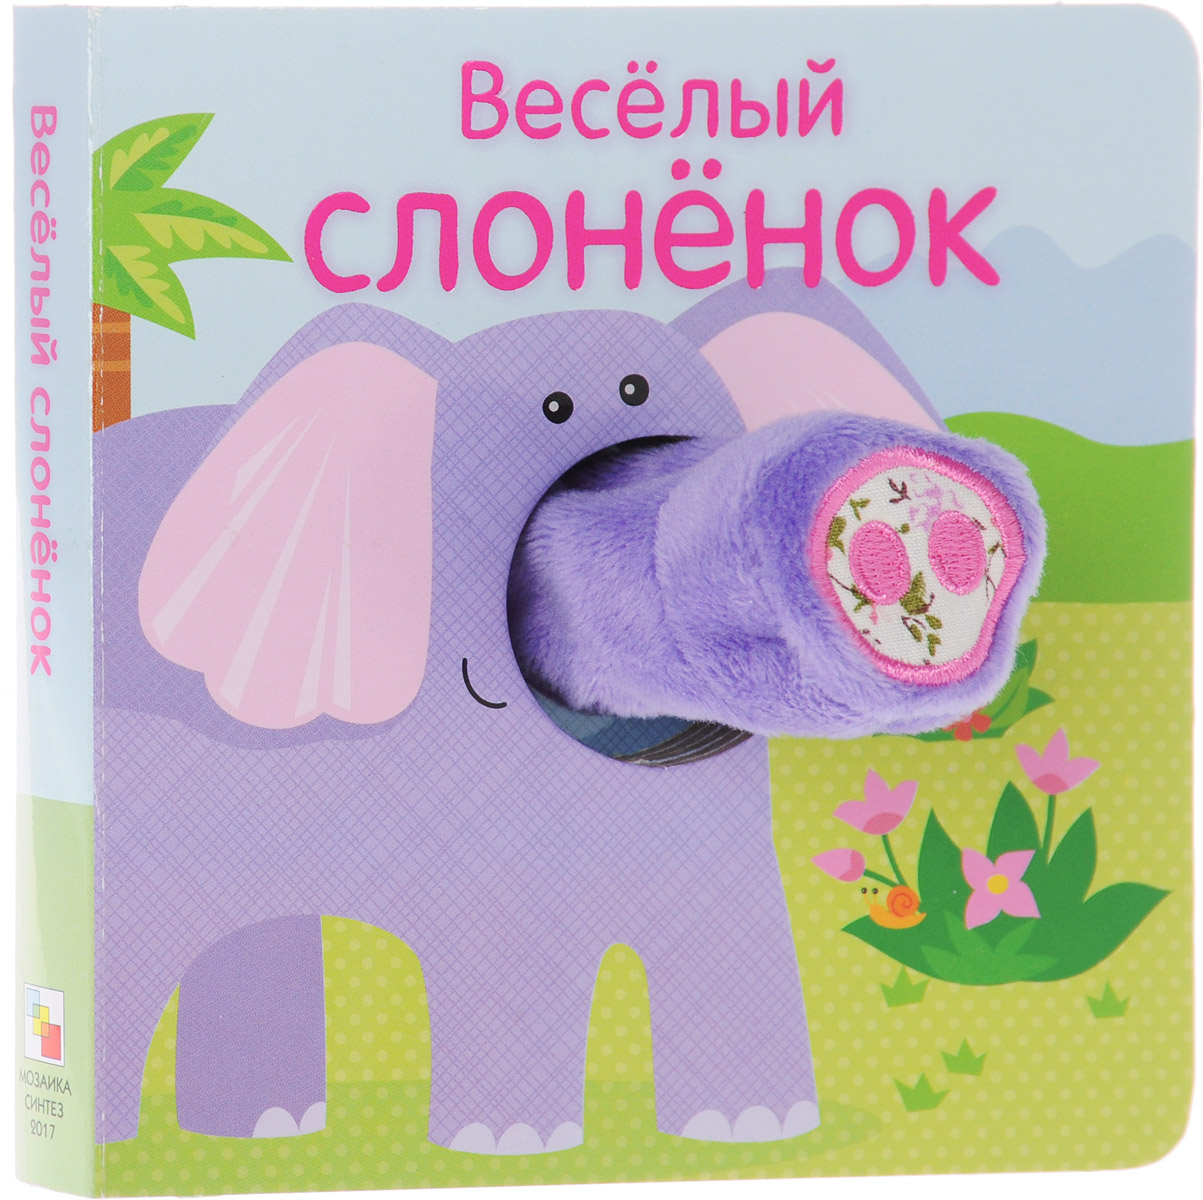 О. Мозалева Веселый слоненок. Книжка-игрушка